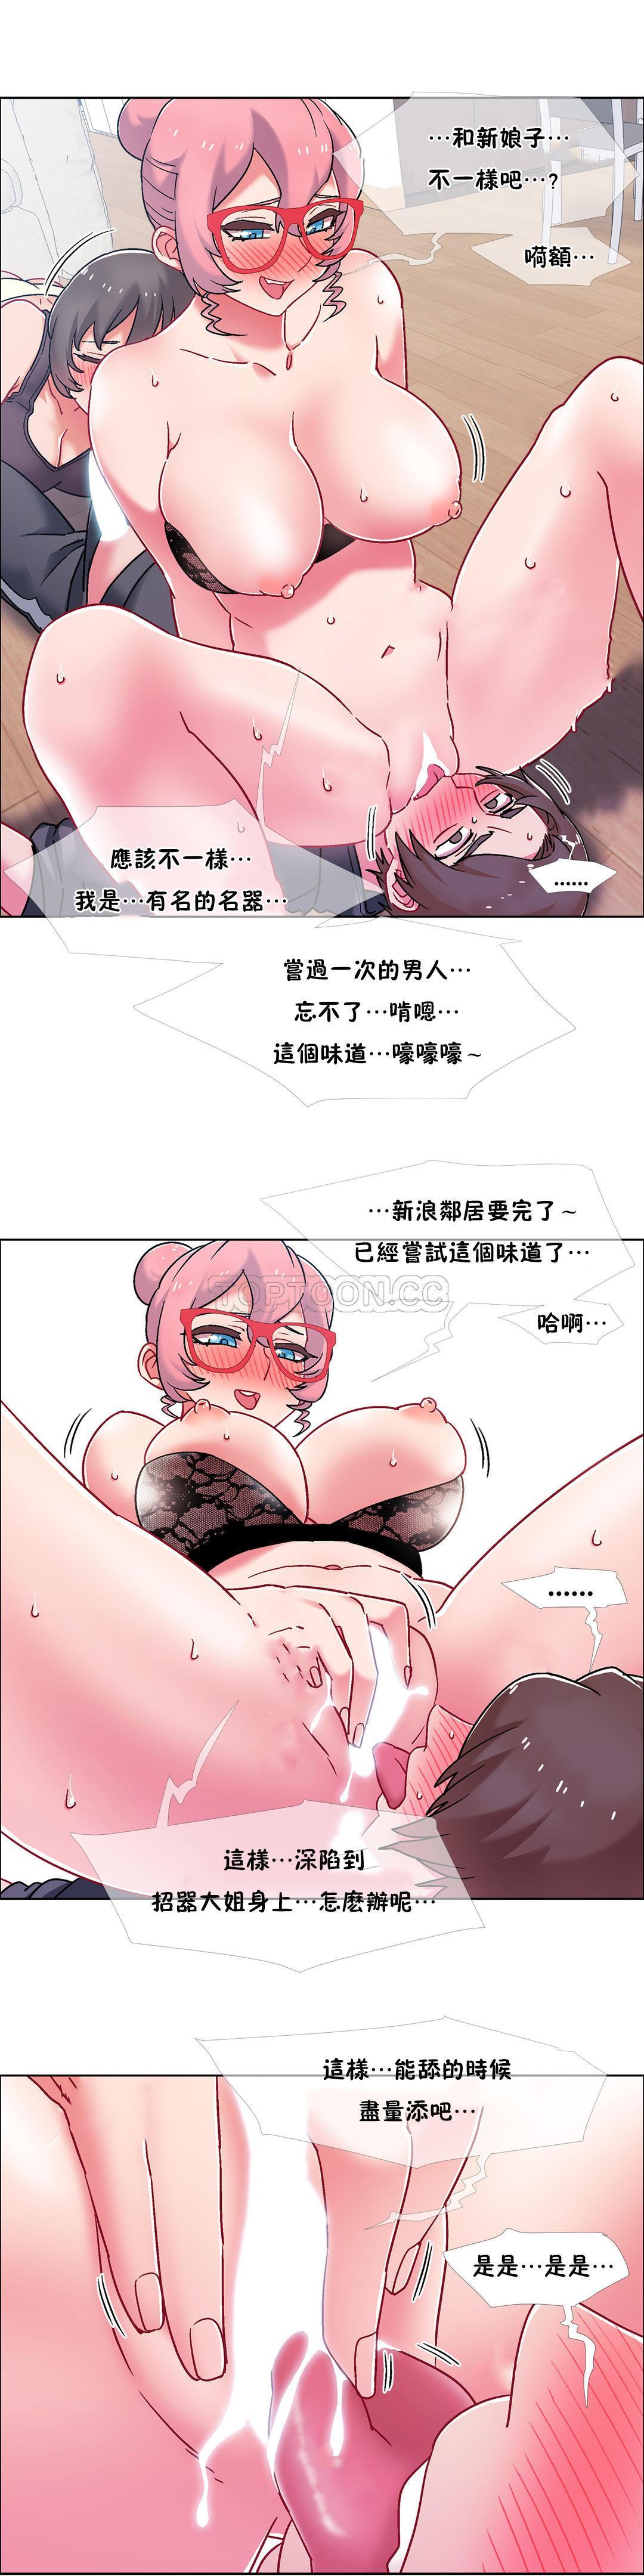 [Studio Wannabe] Rental Girls | 出租女郎 Ch. 33-58 [Chinese]  第二季 完结 360